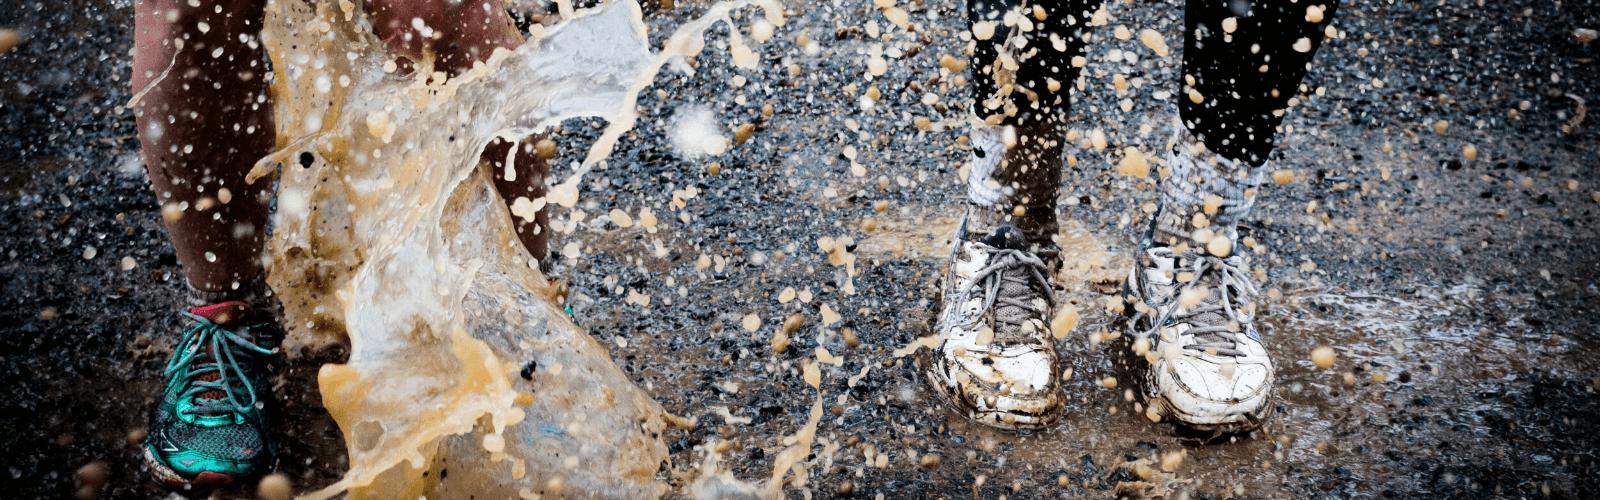 Kilbroney Night Walk – 7 February 2020